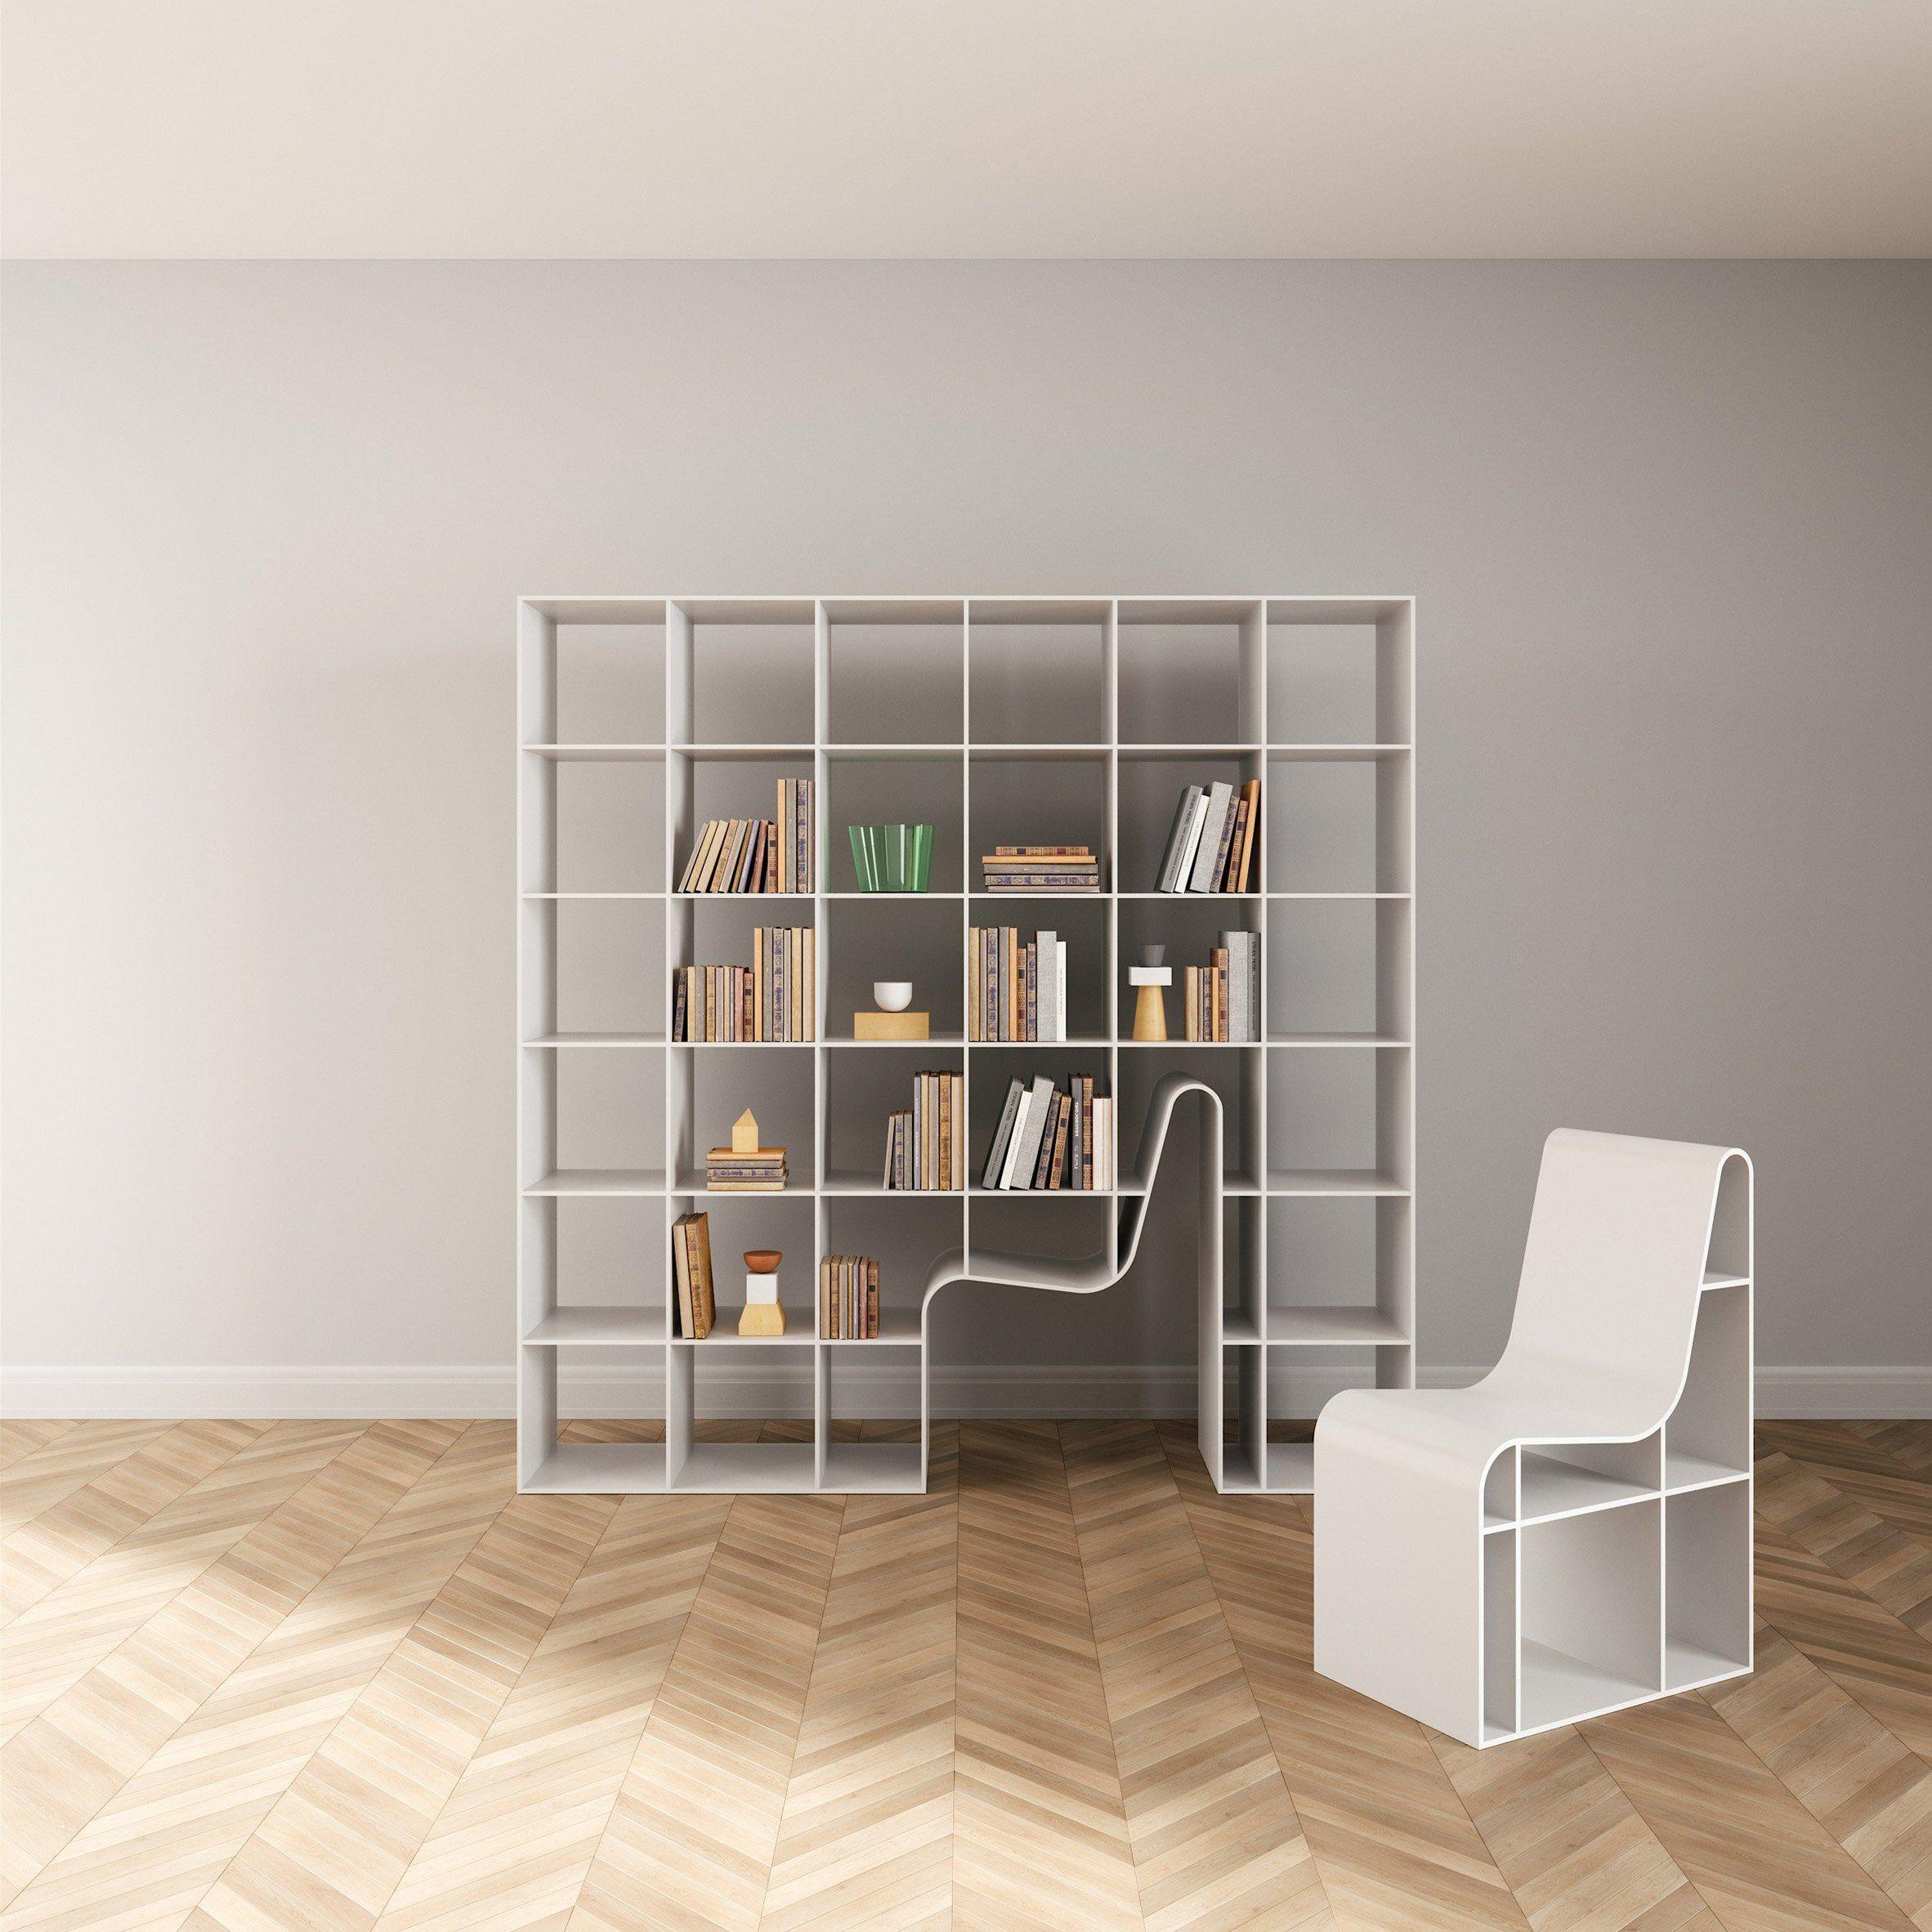 Sou Fujimoto designs hybrid bookshelf and chair